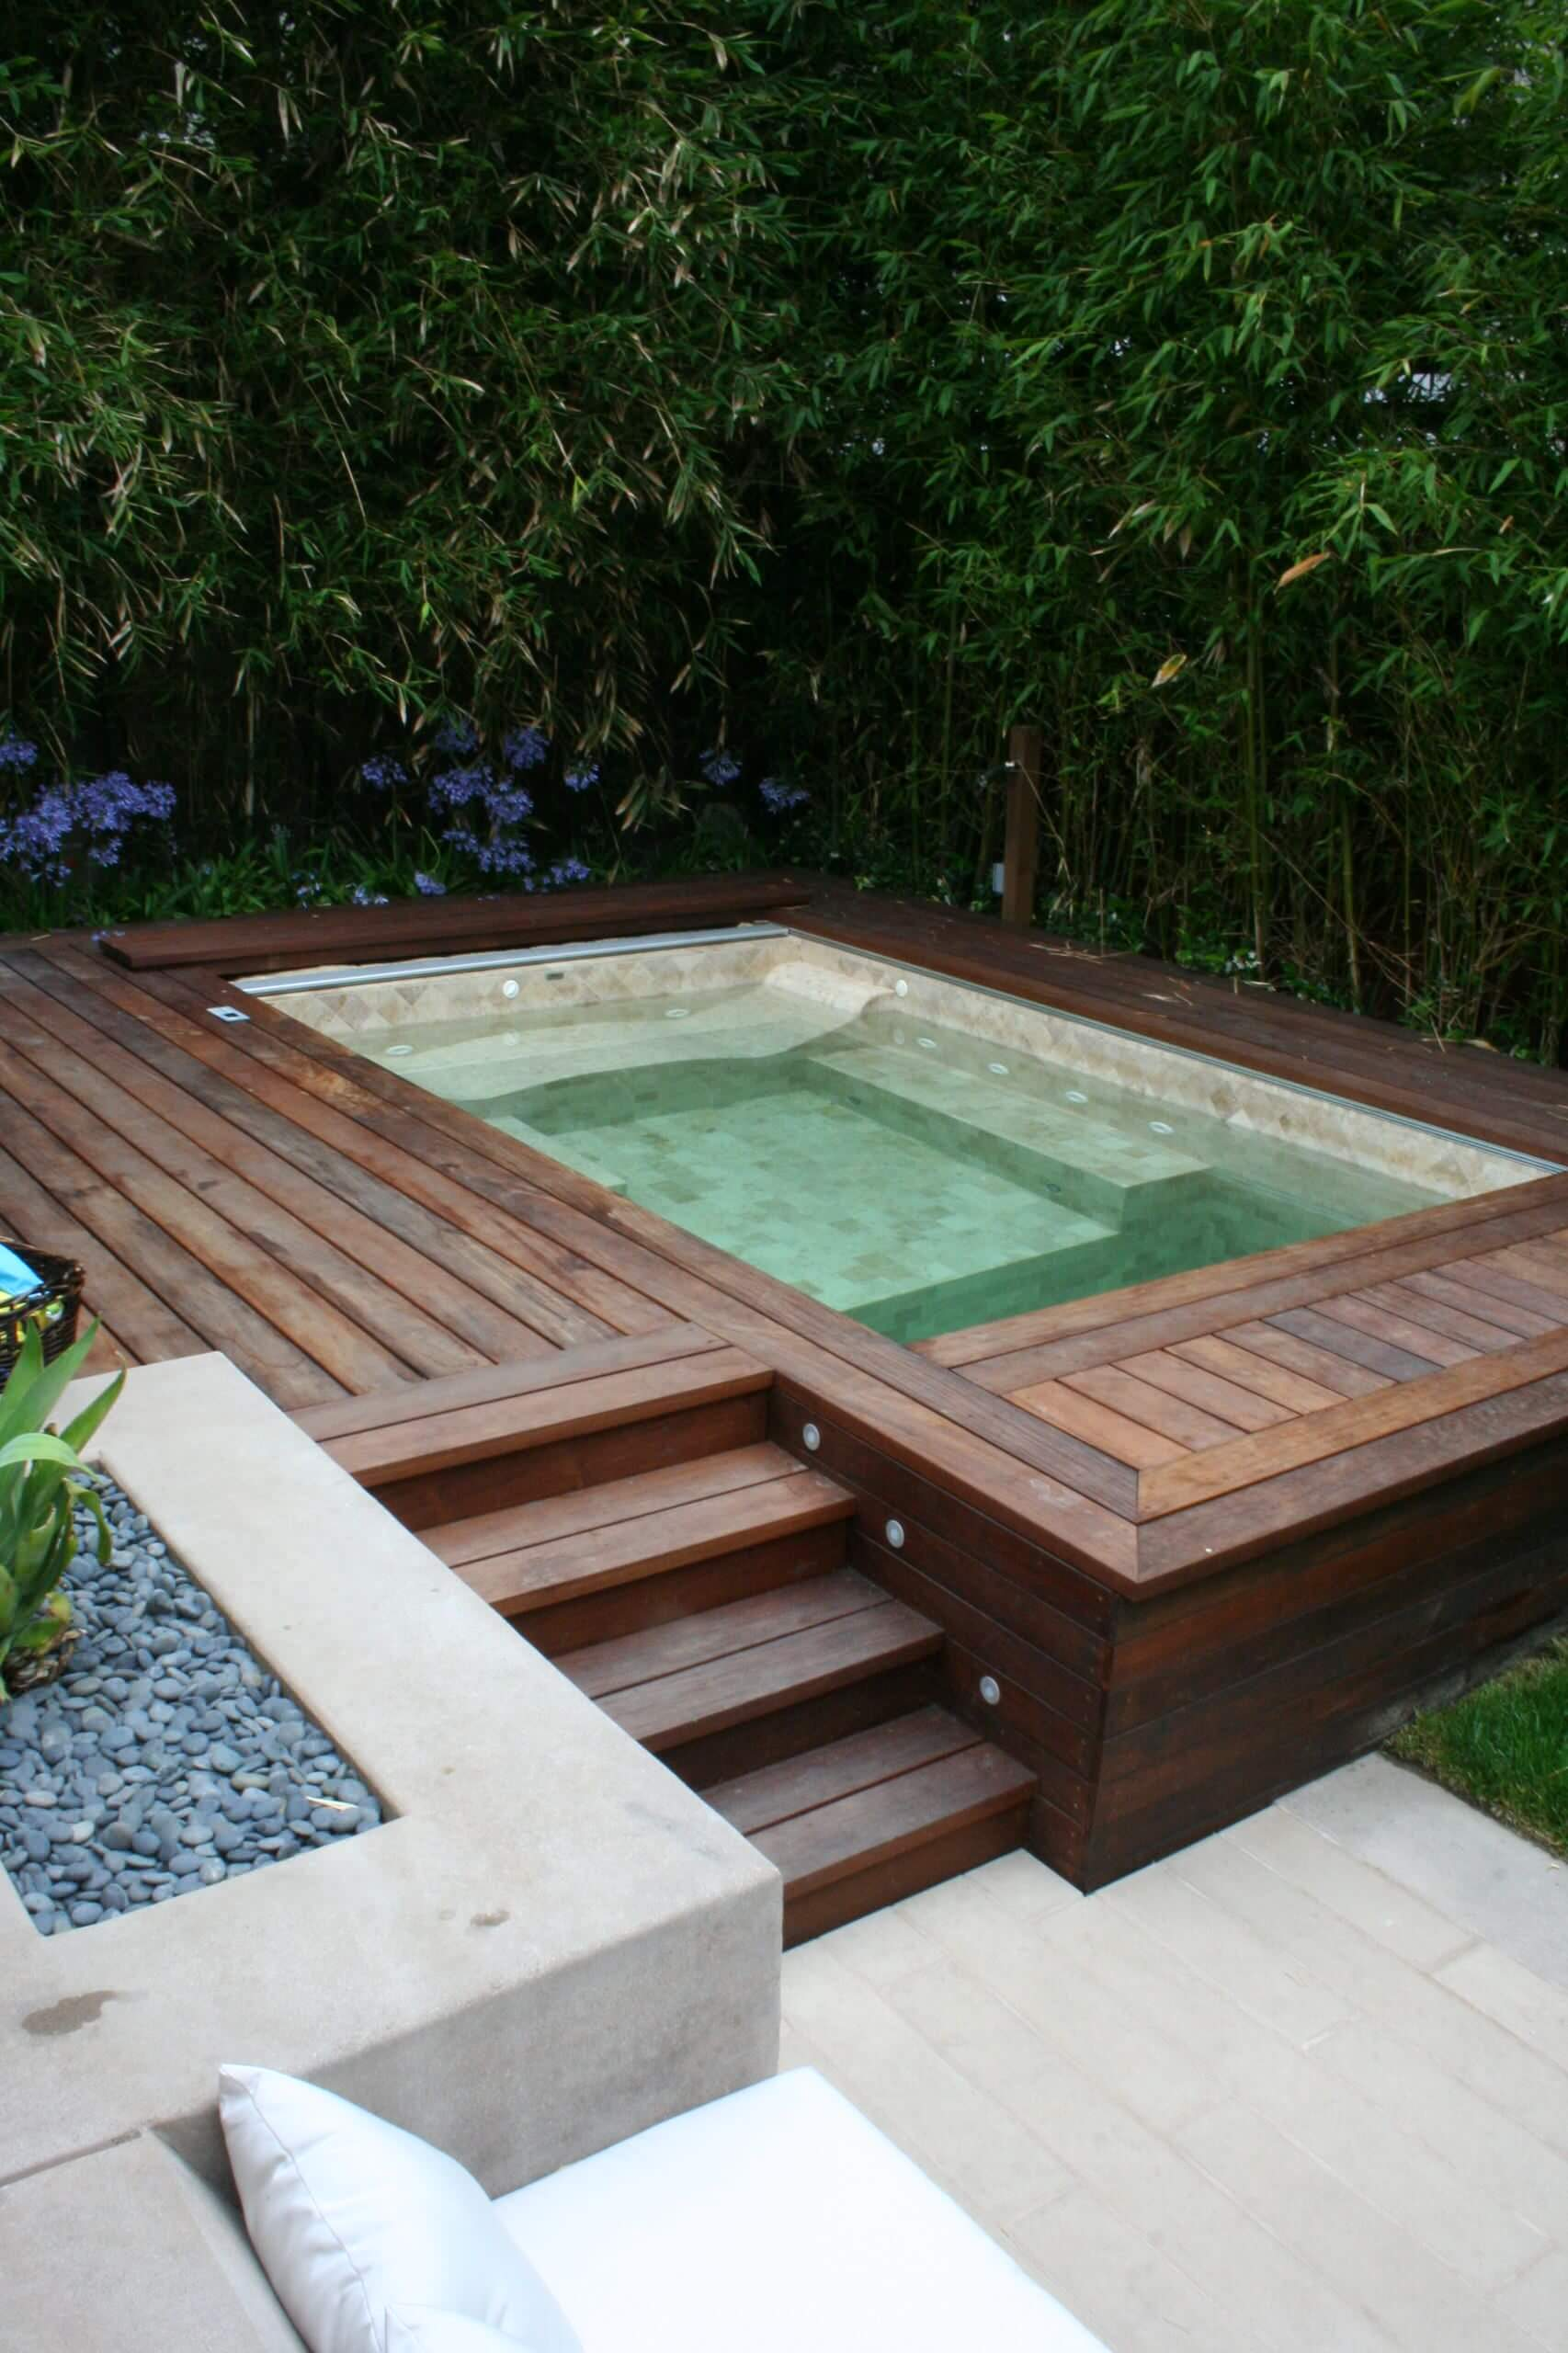 Piscina elevada retangular no jardim moderno